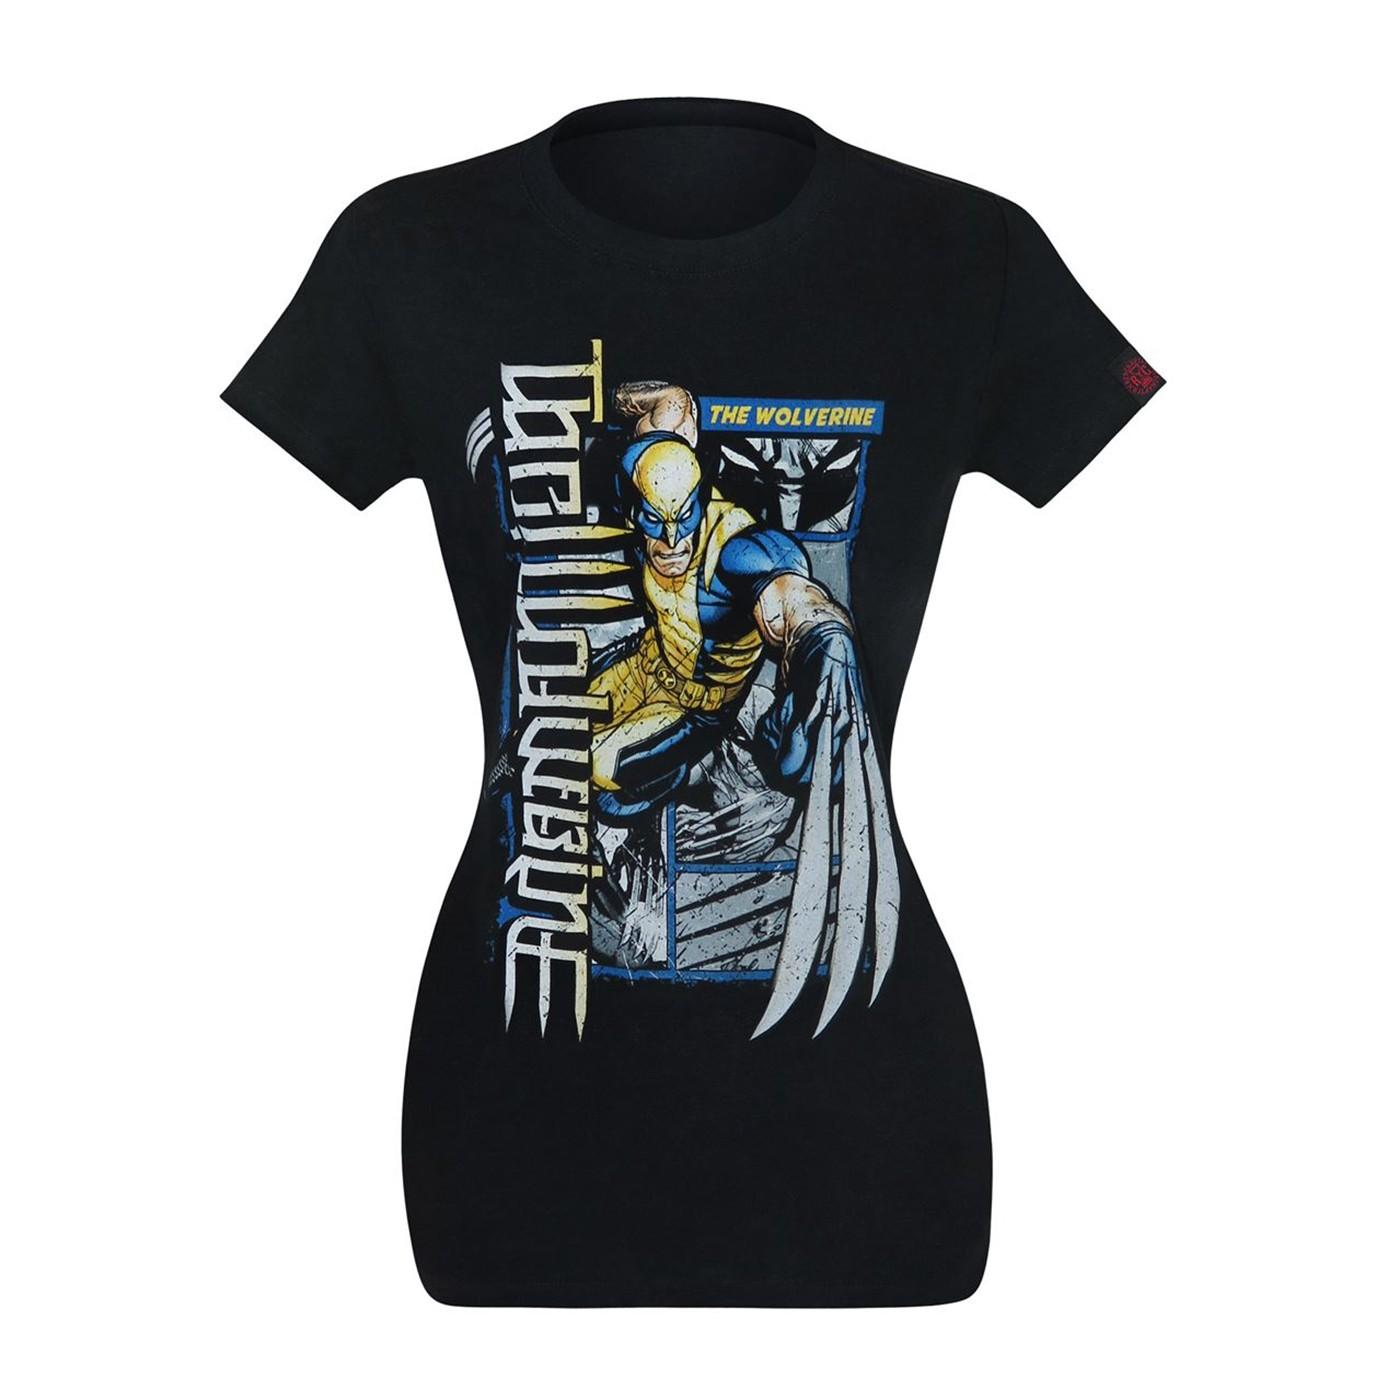 The Wolverine Ambigram Women's T-Shirt